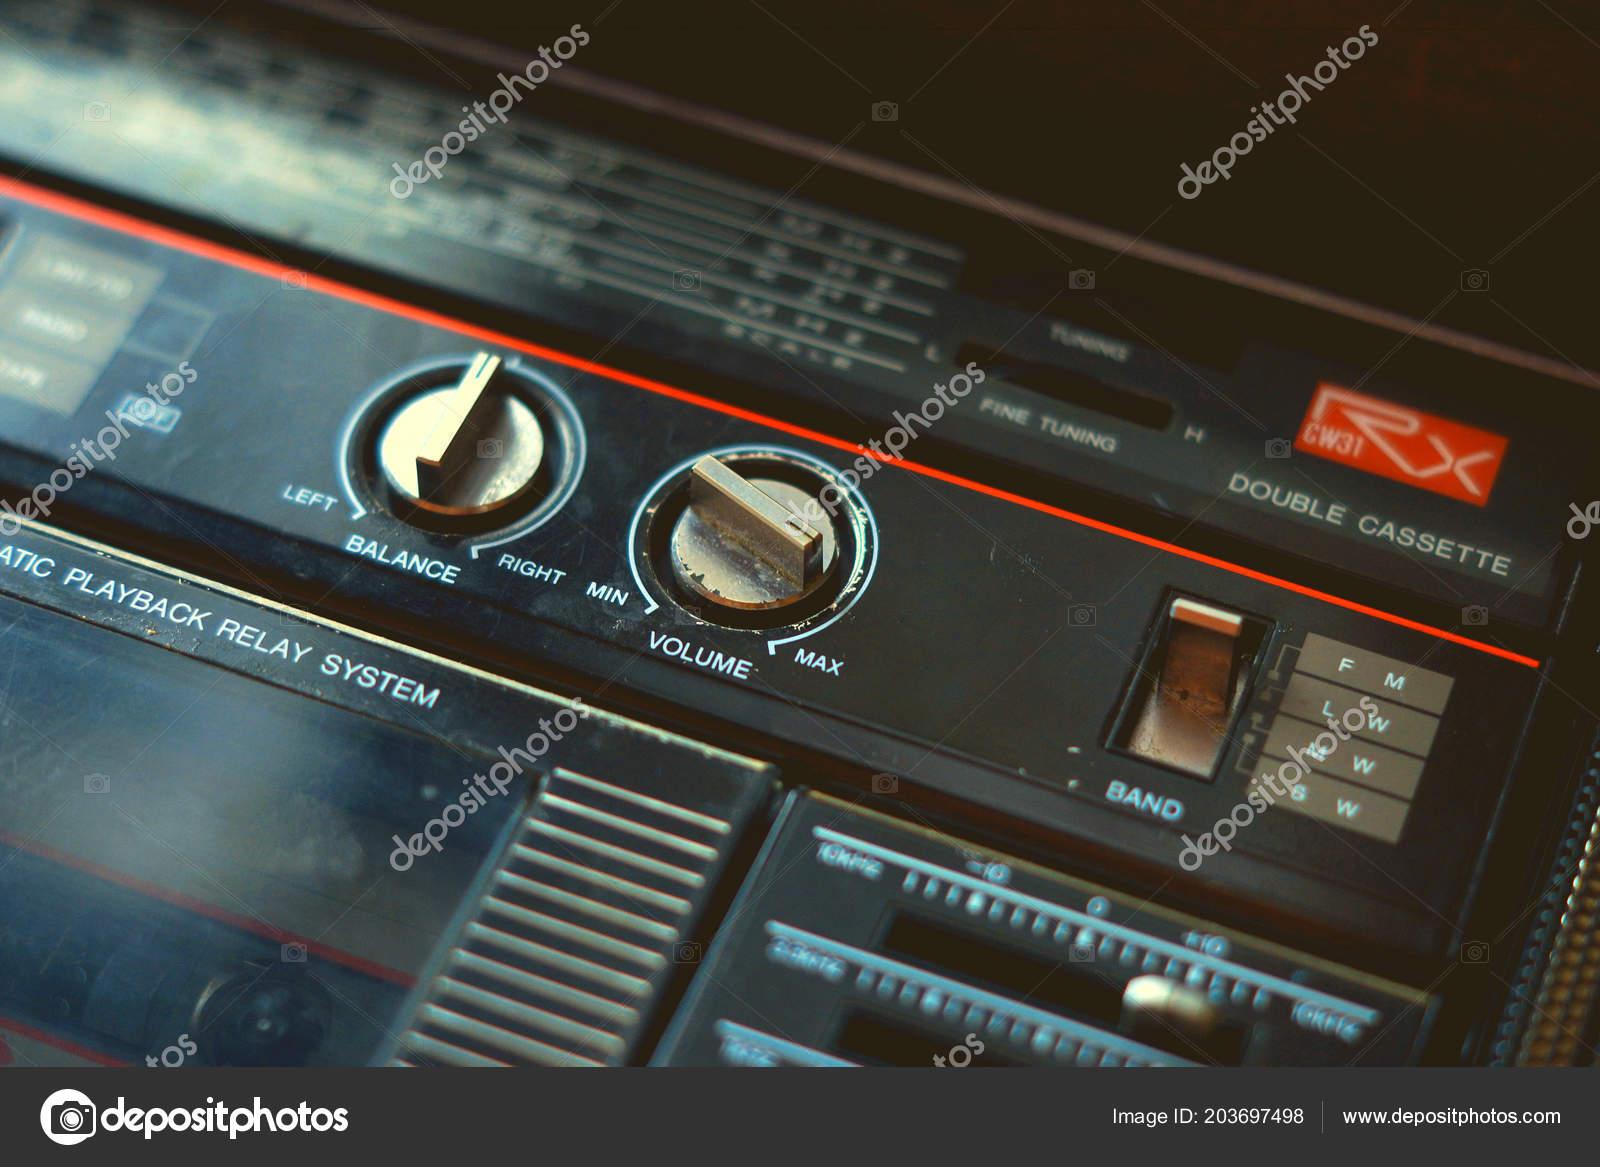 Música Reproductor Cassette Wallpaper Fondo Retro Vintage